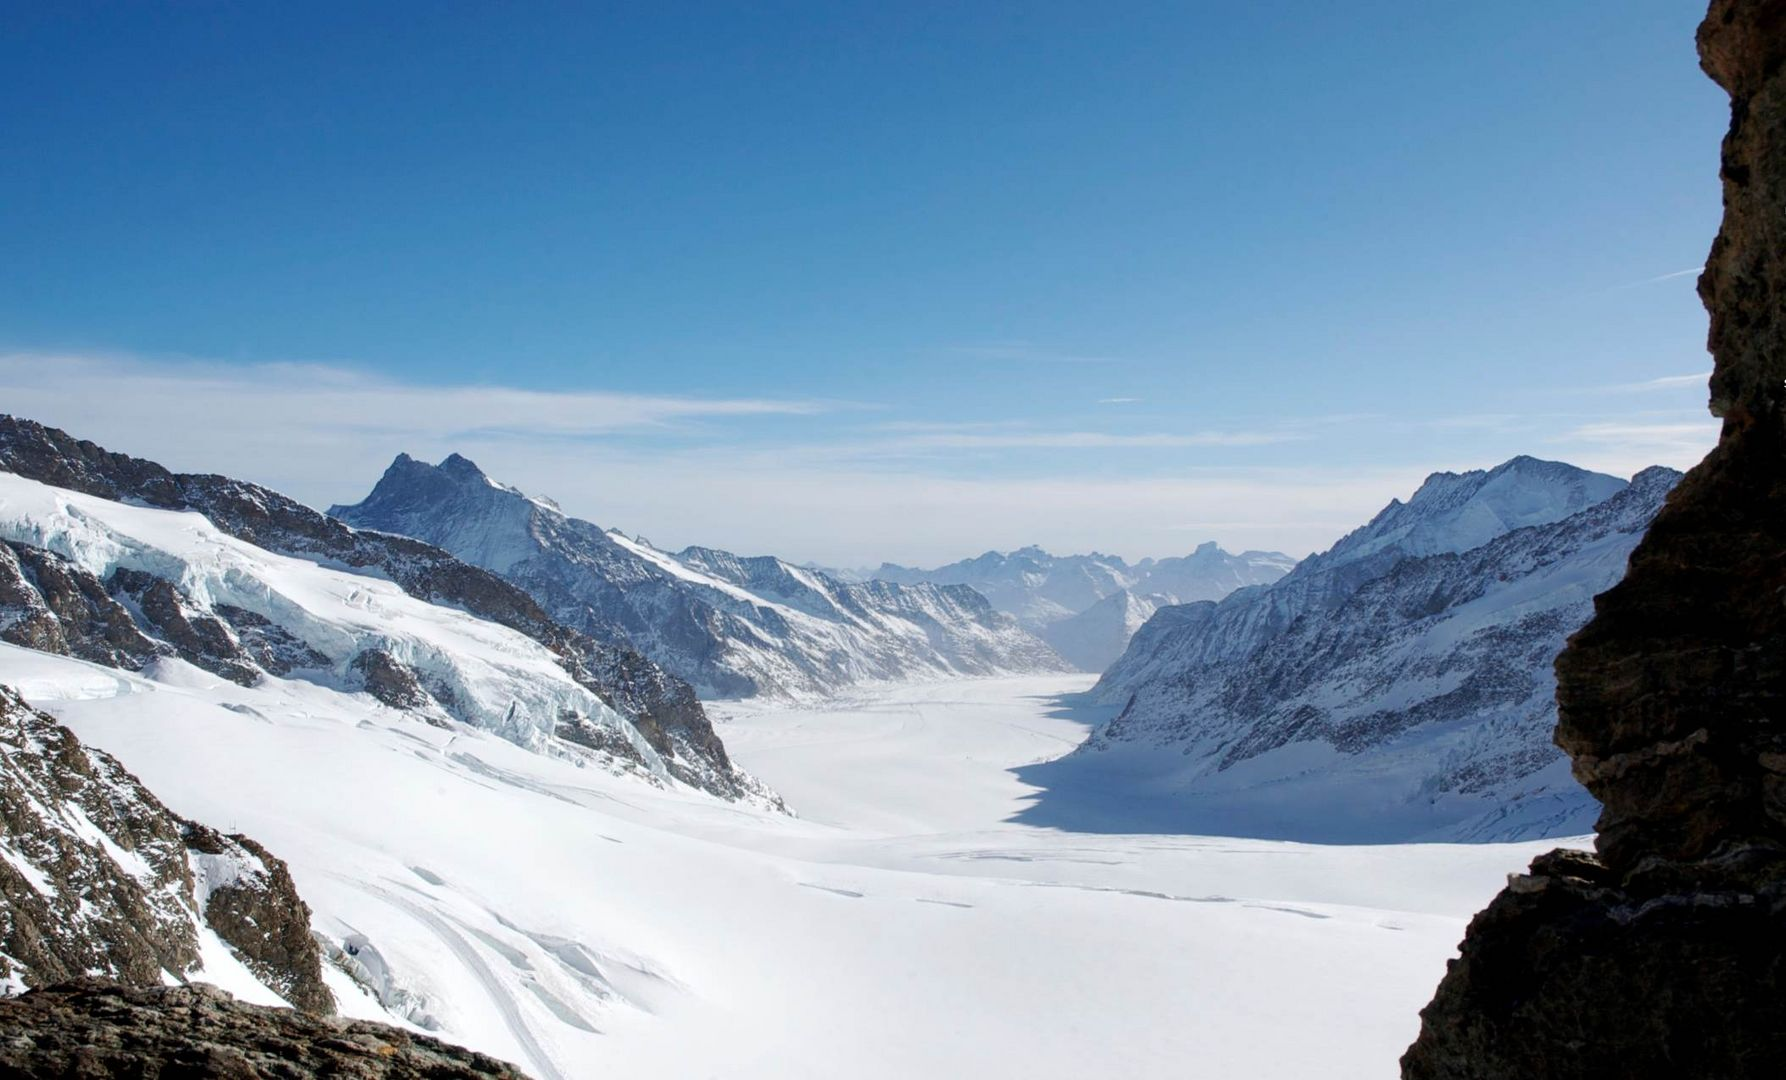 Jungfrau-Joch